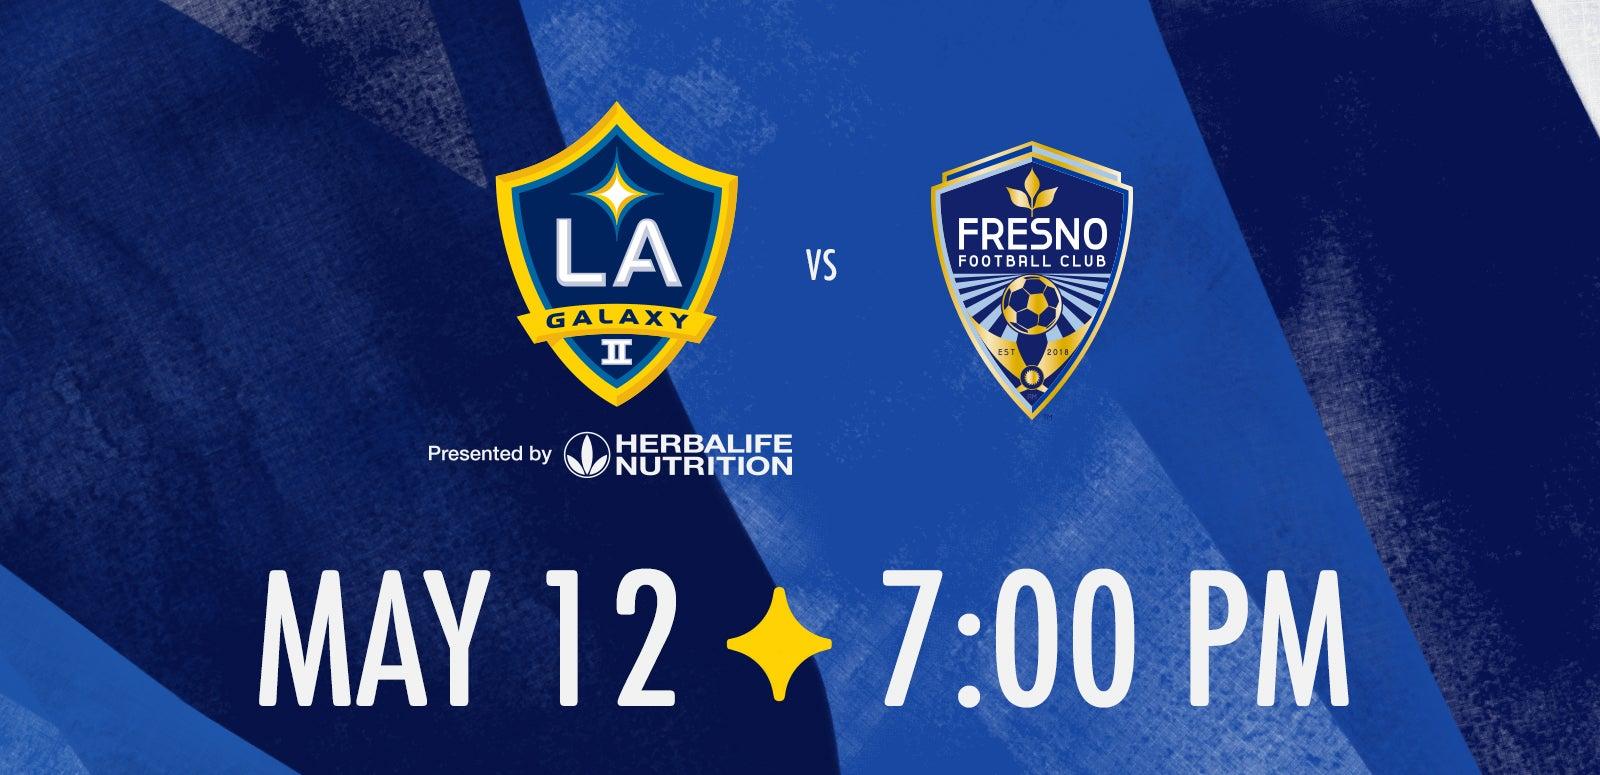 LA Galaxy II vs. Fresno FC